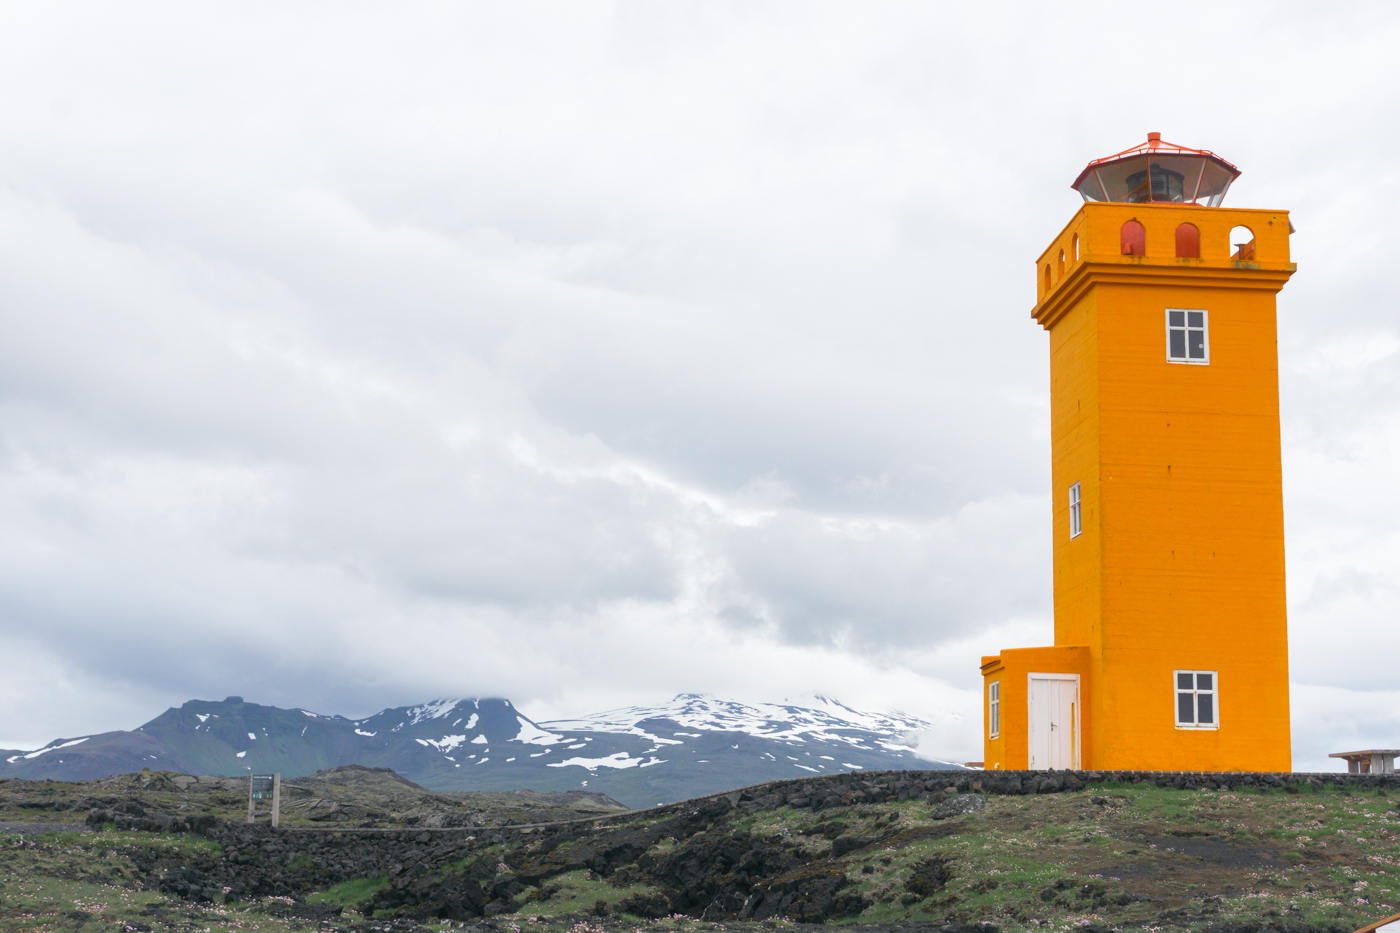 Phare orange - Péninsule de Snaefellsnes - Quoi voir en Islande?